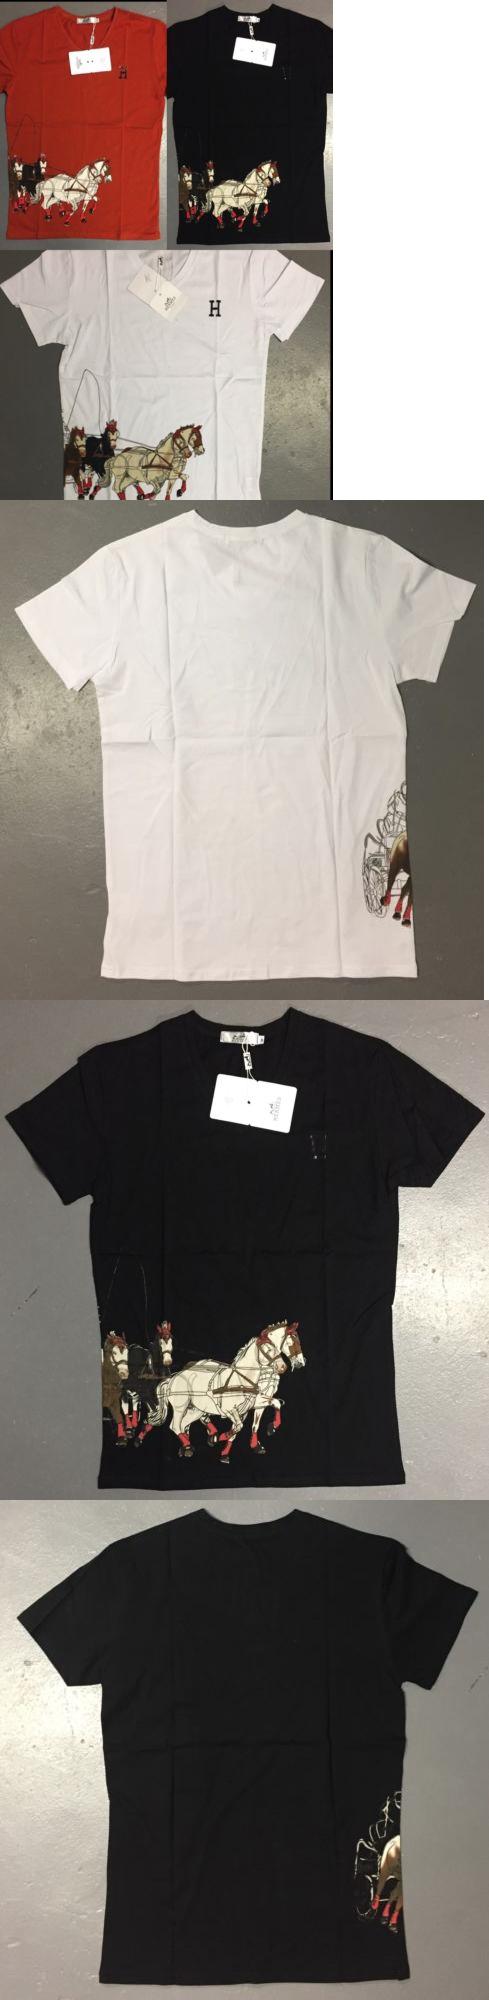 bee5e1c5 WRG-5771] Men Clothing T Shirts Hermes Brands